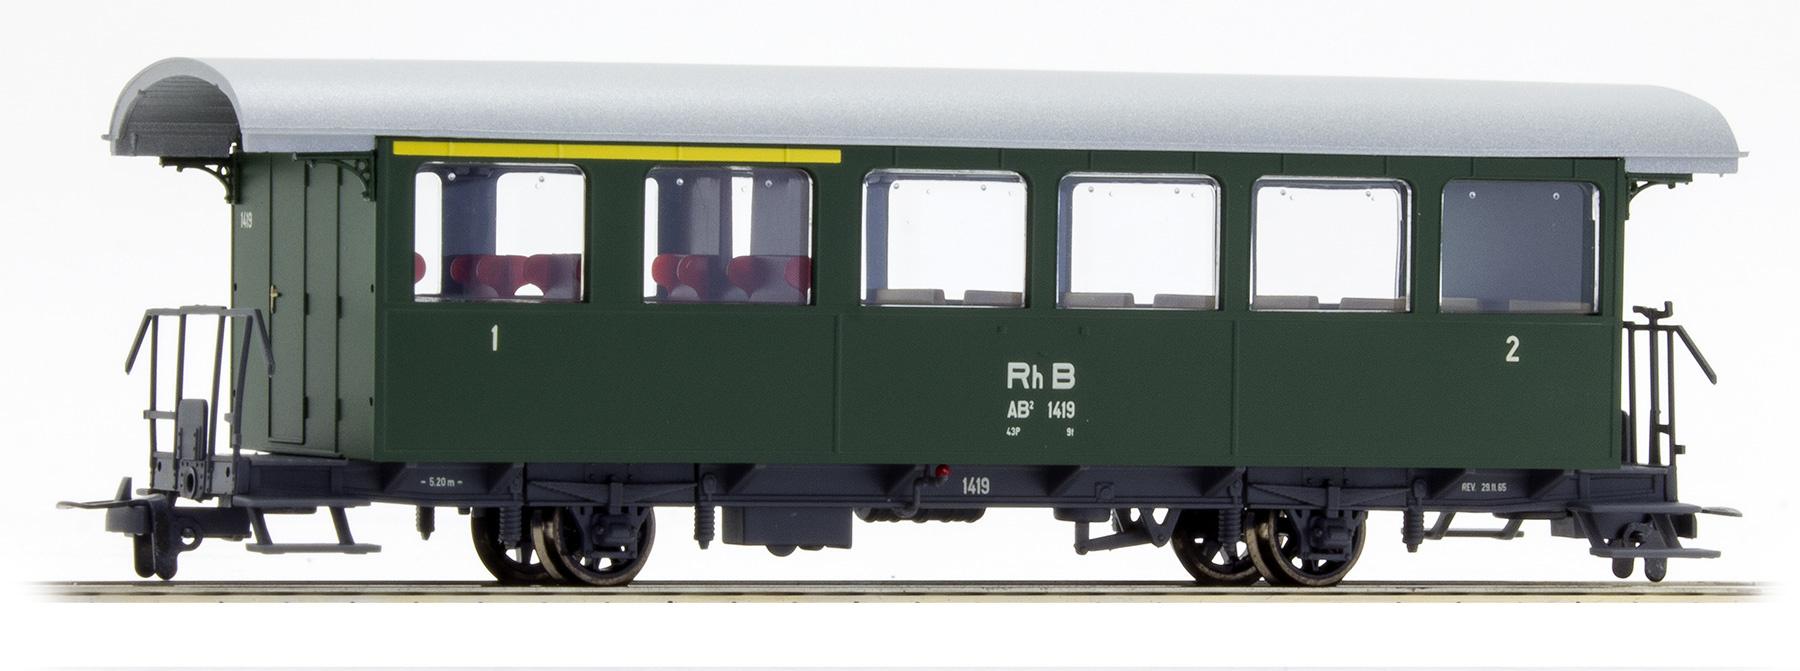 3233129 RhB AB2 1419 Zweiachser grün-1